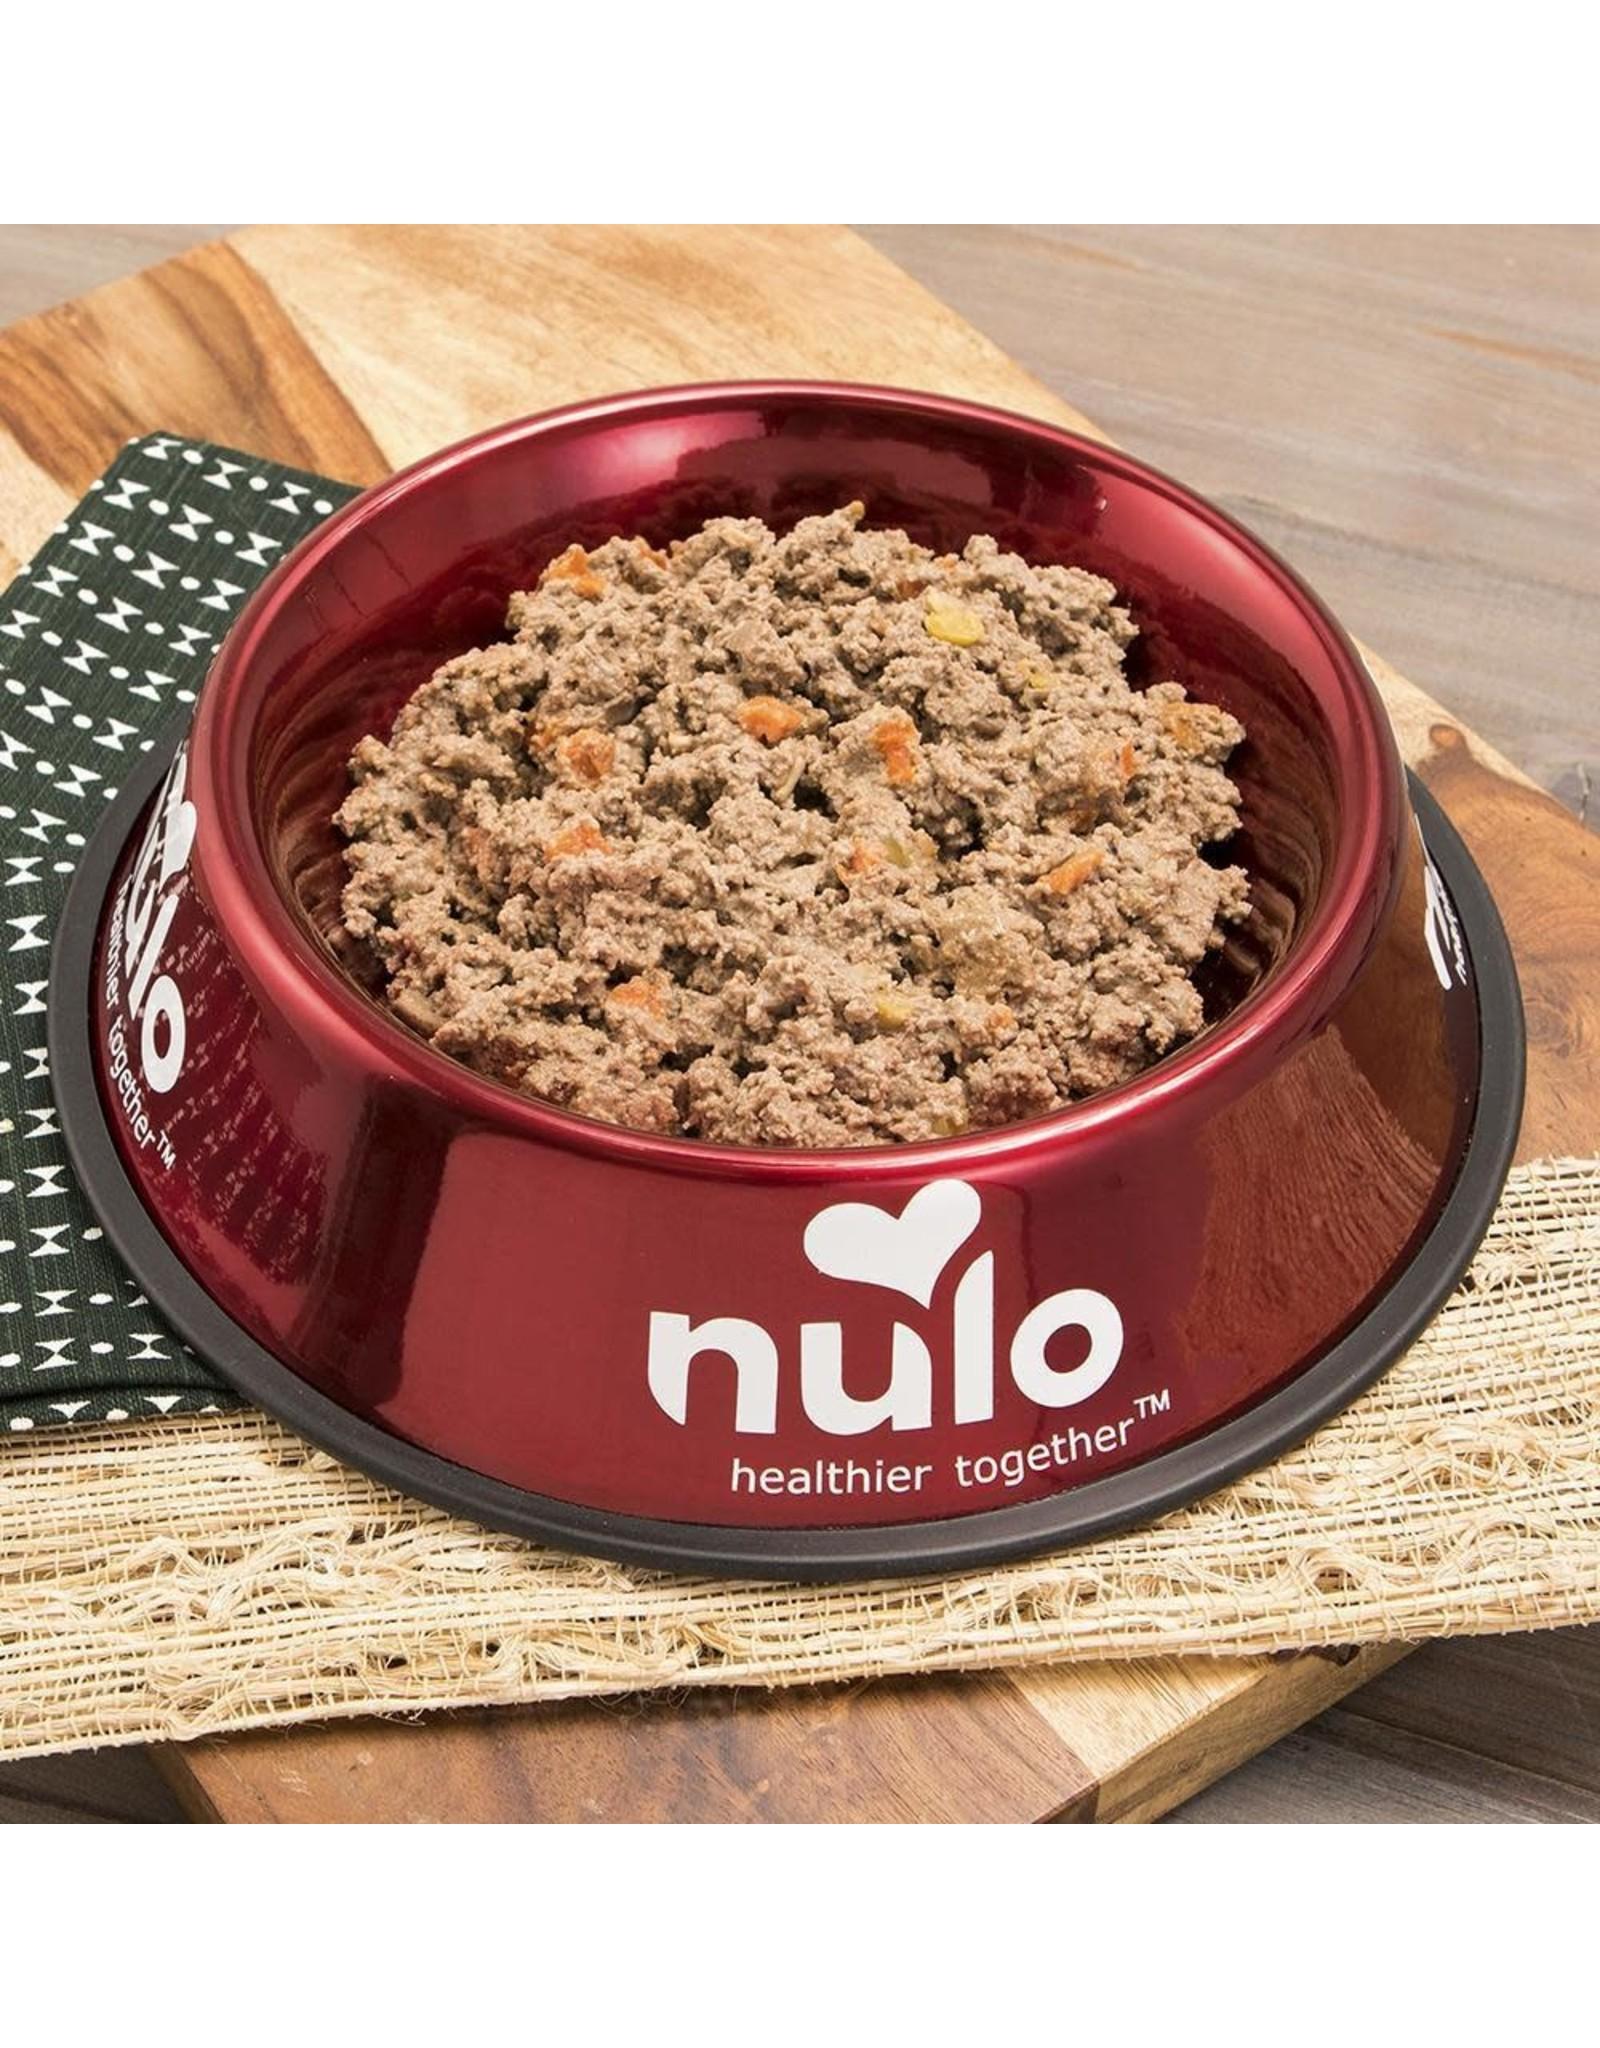 Nulo Freestyle Adult Turkey, Salmon & Chickpeas Canned Dog Food